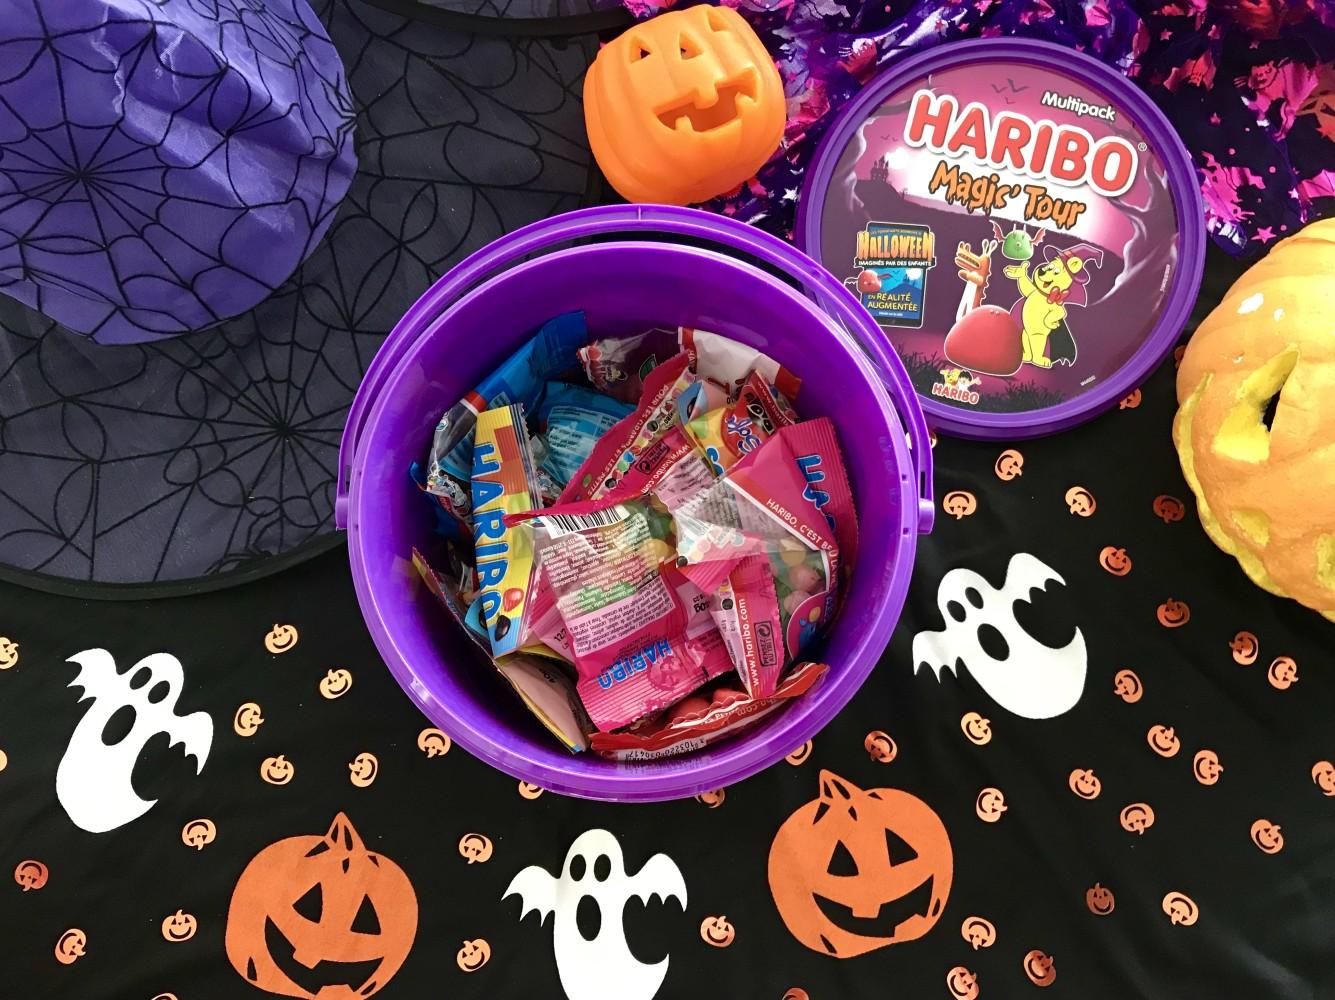 Bonbons Haribo Halloween sachets